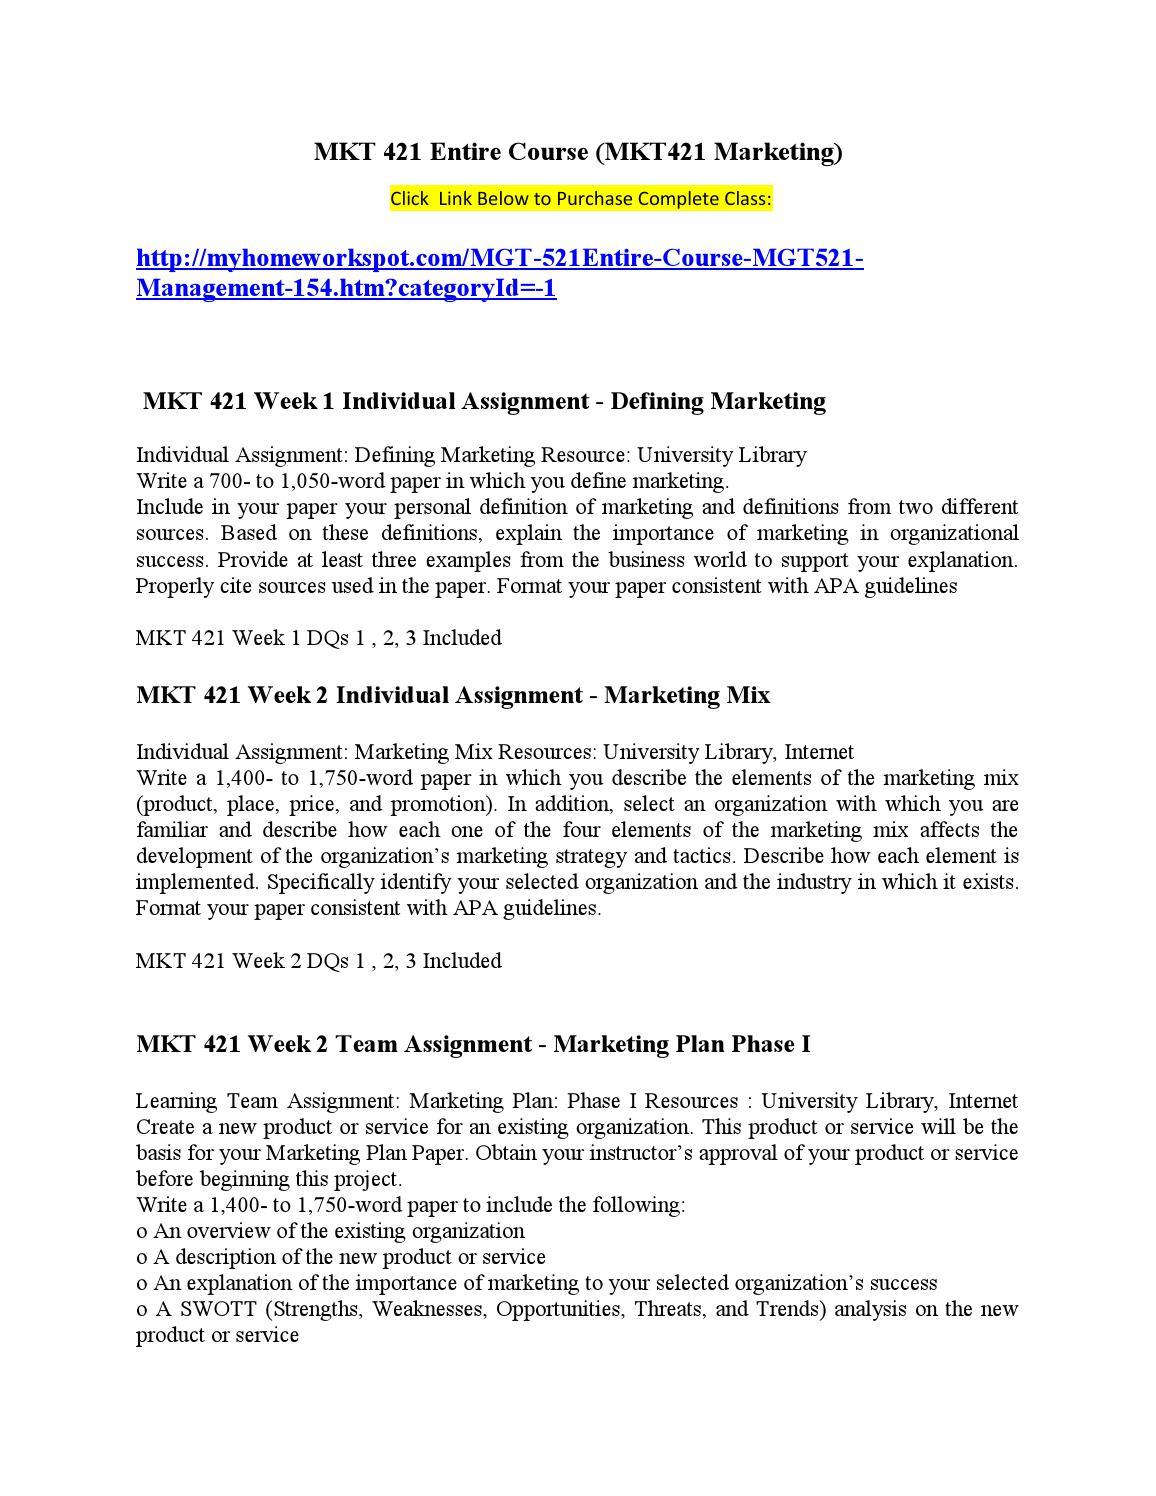 marketing mix analysis marketing 421